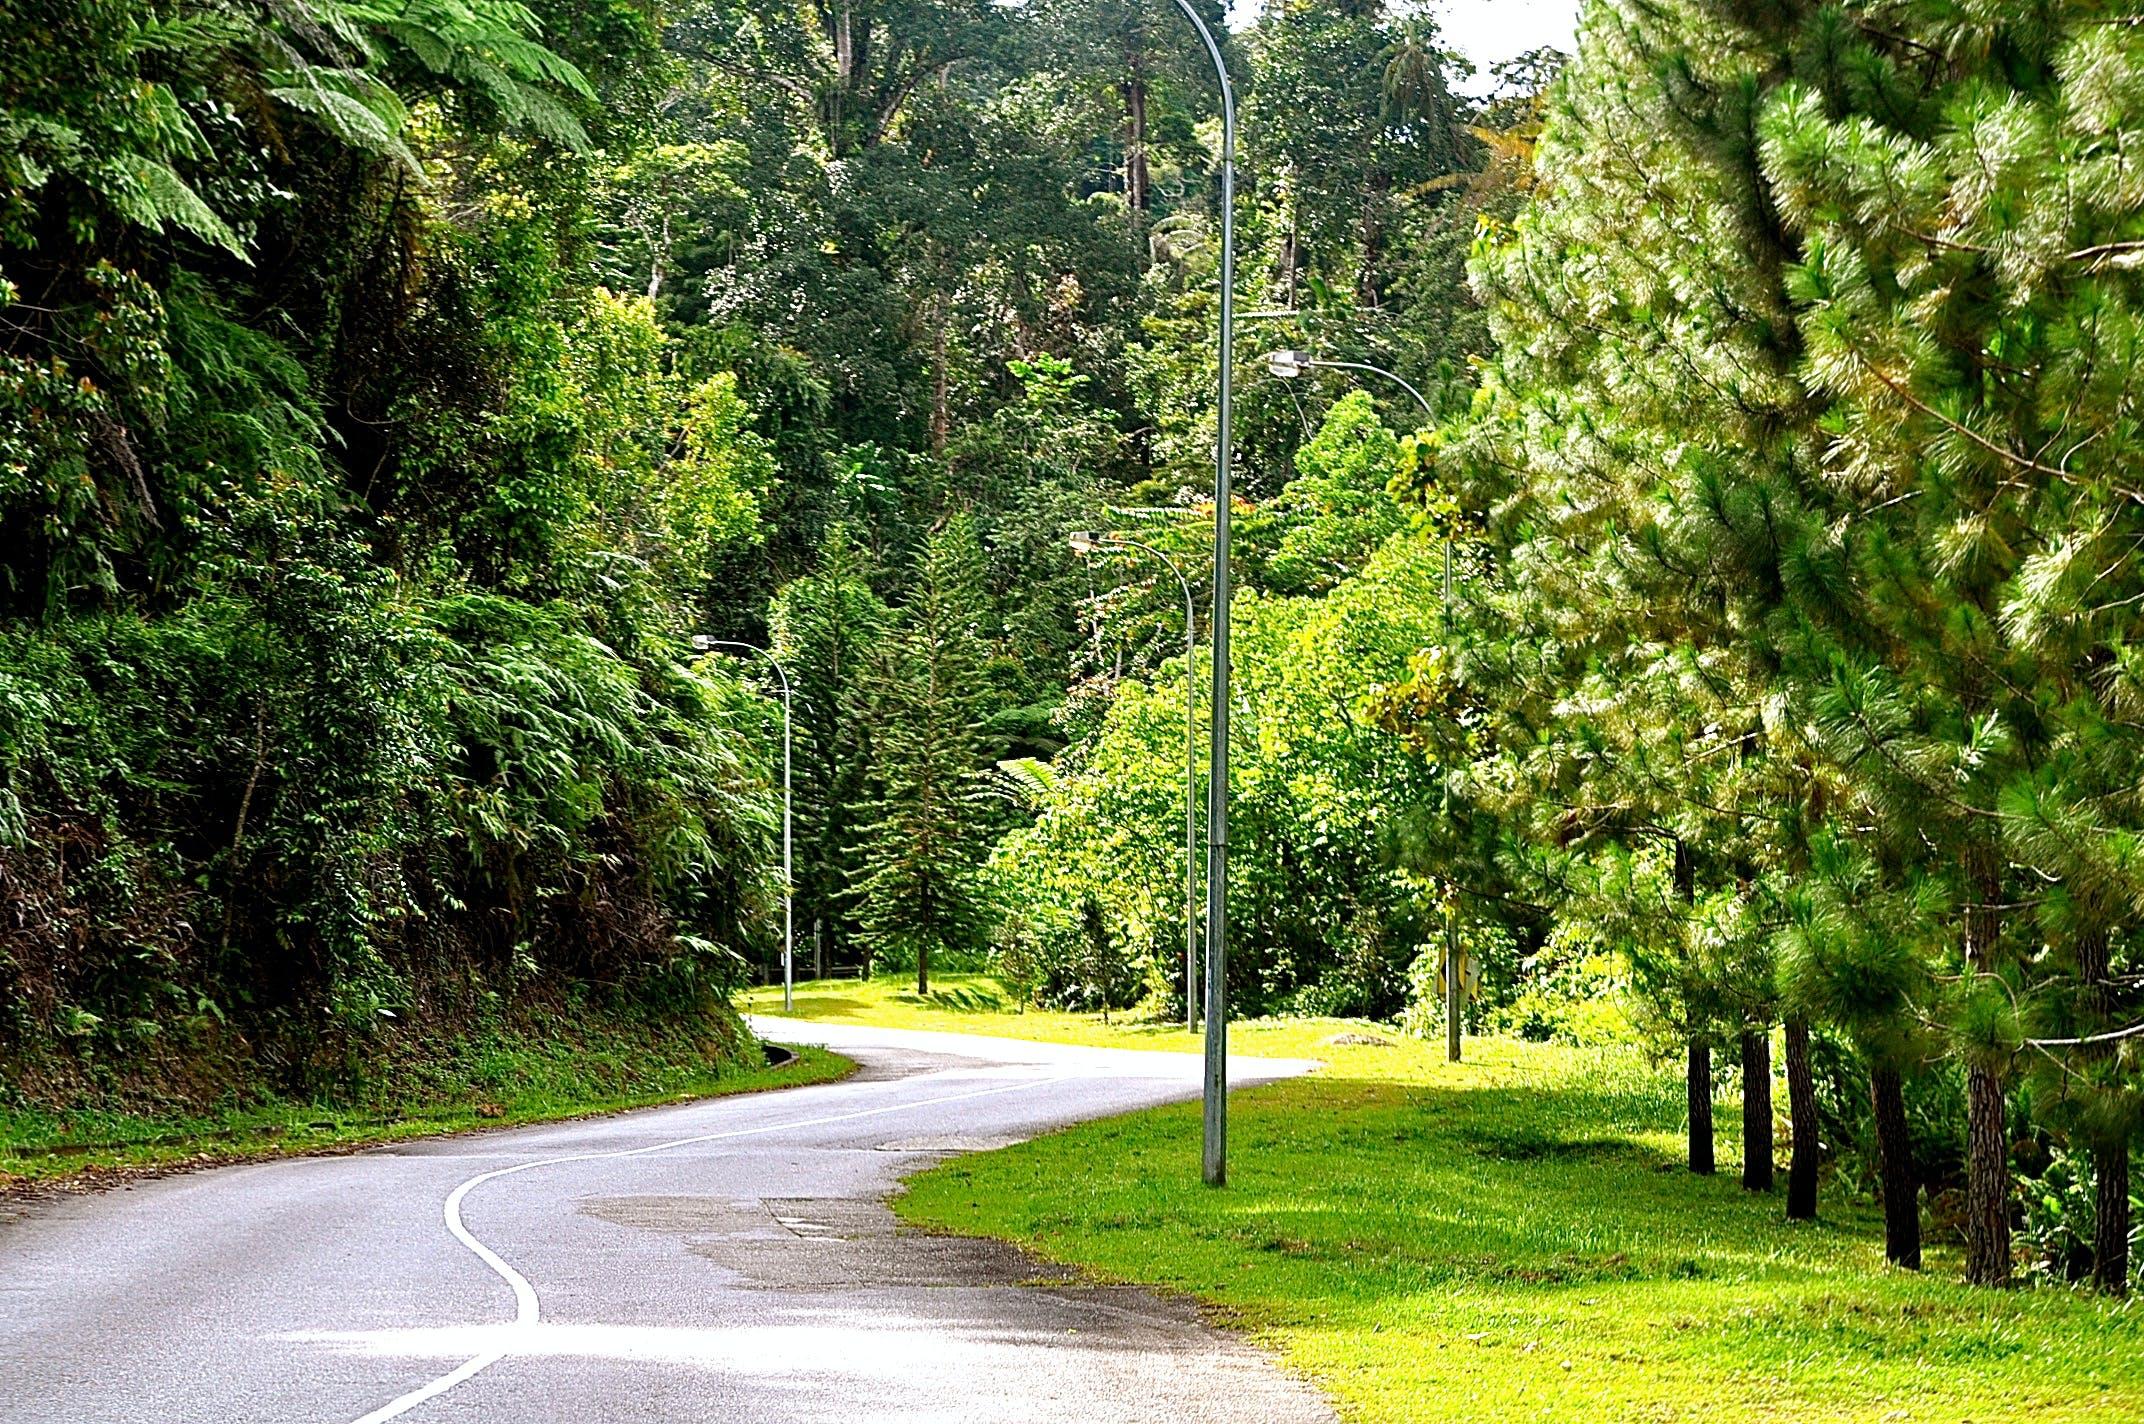 Free stock photo of Putrajaya Malaysia